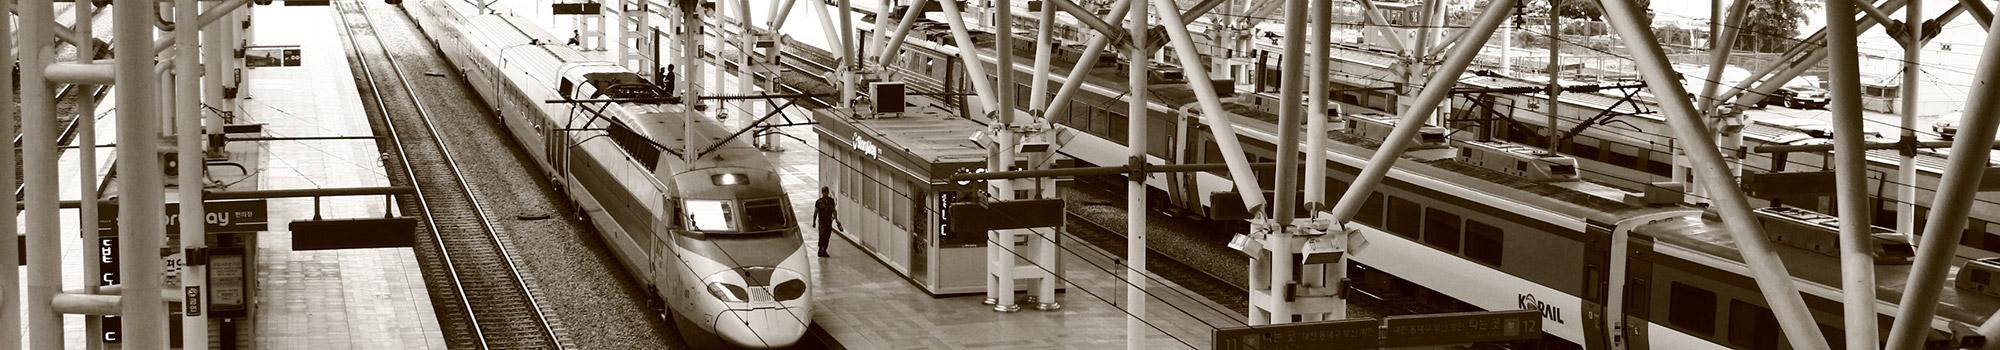 European railway station.